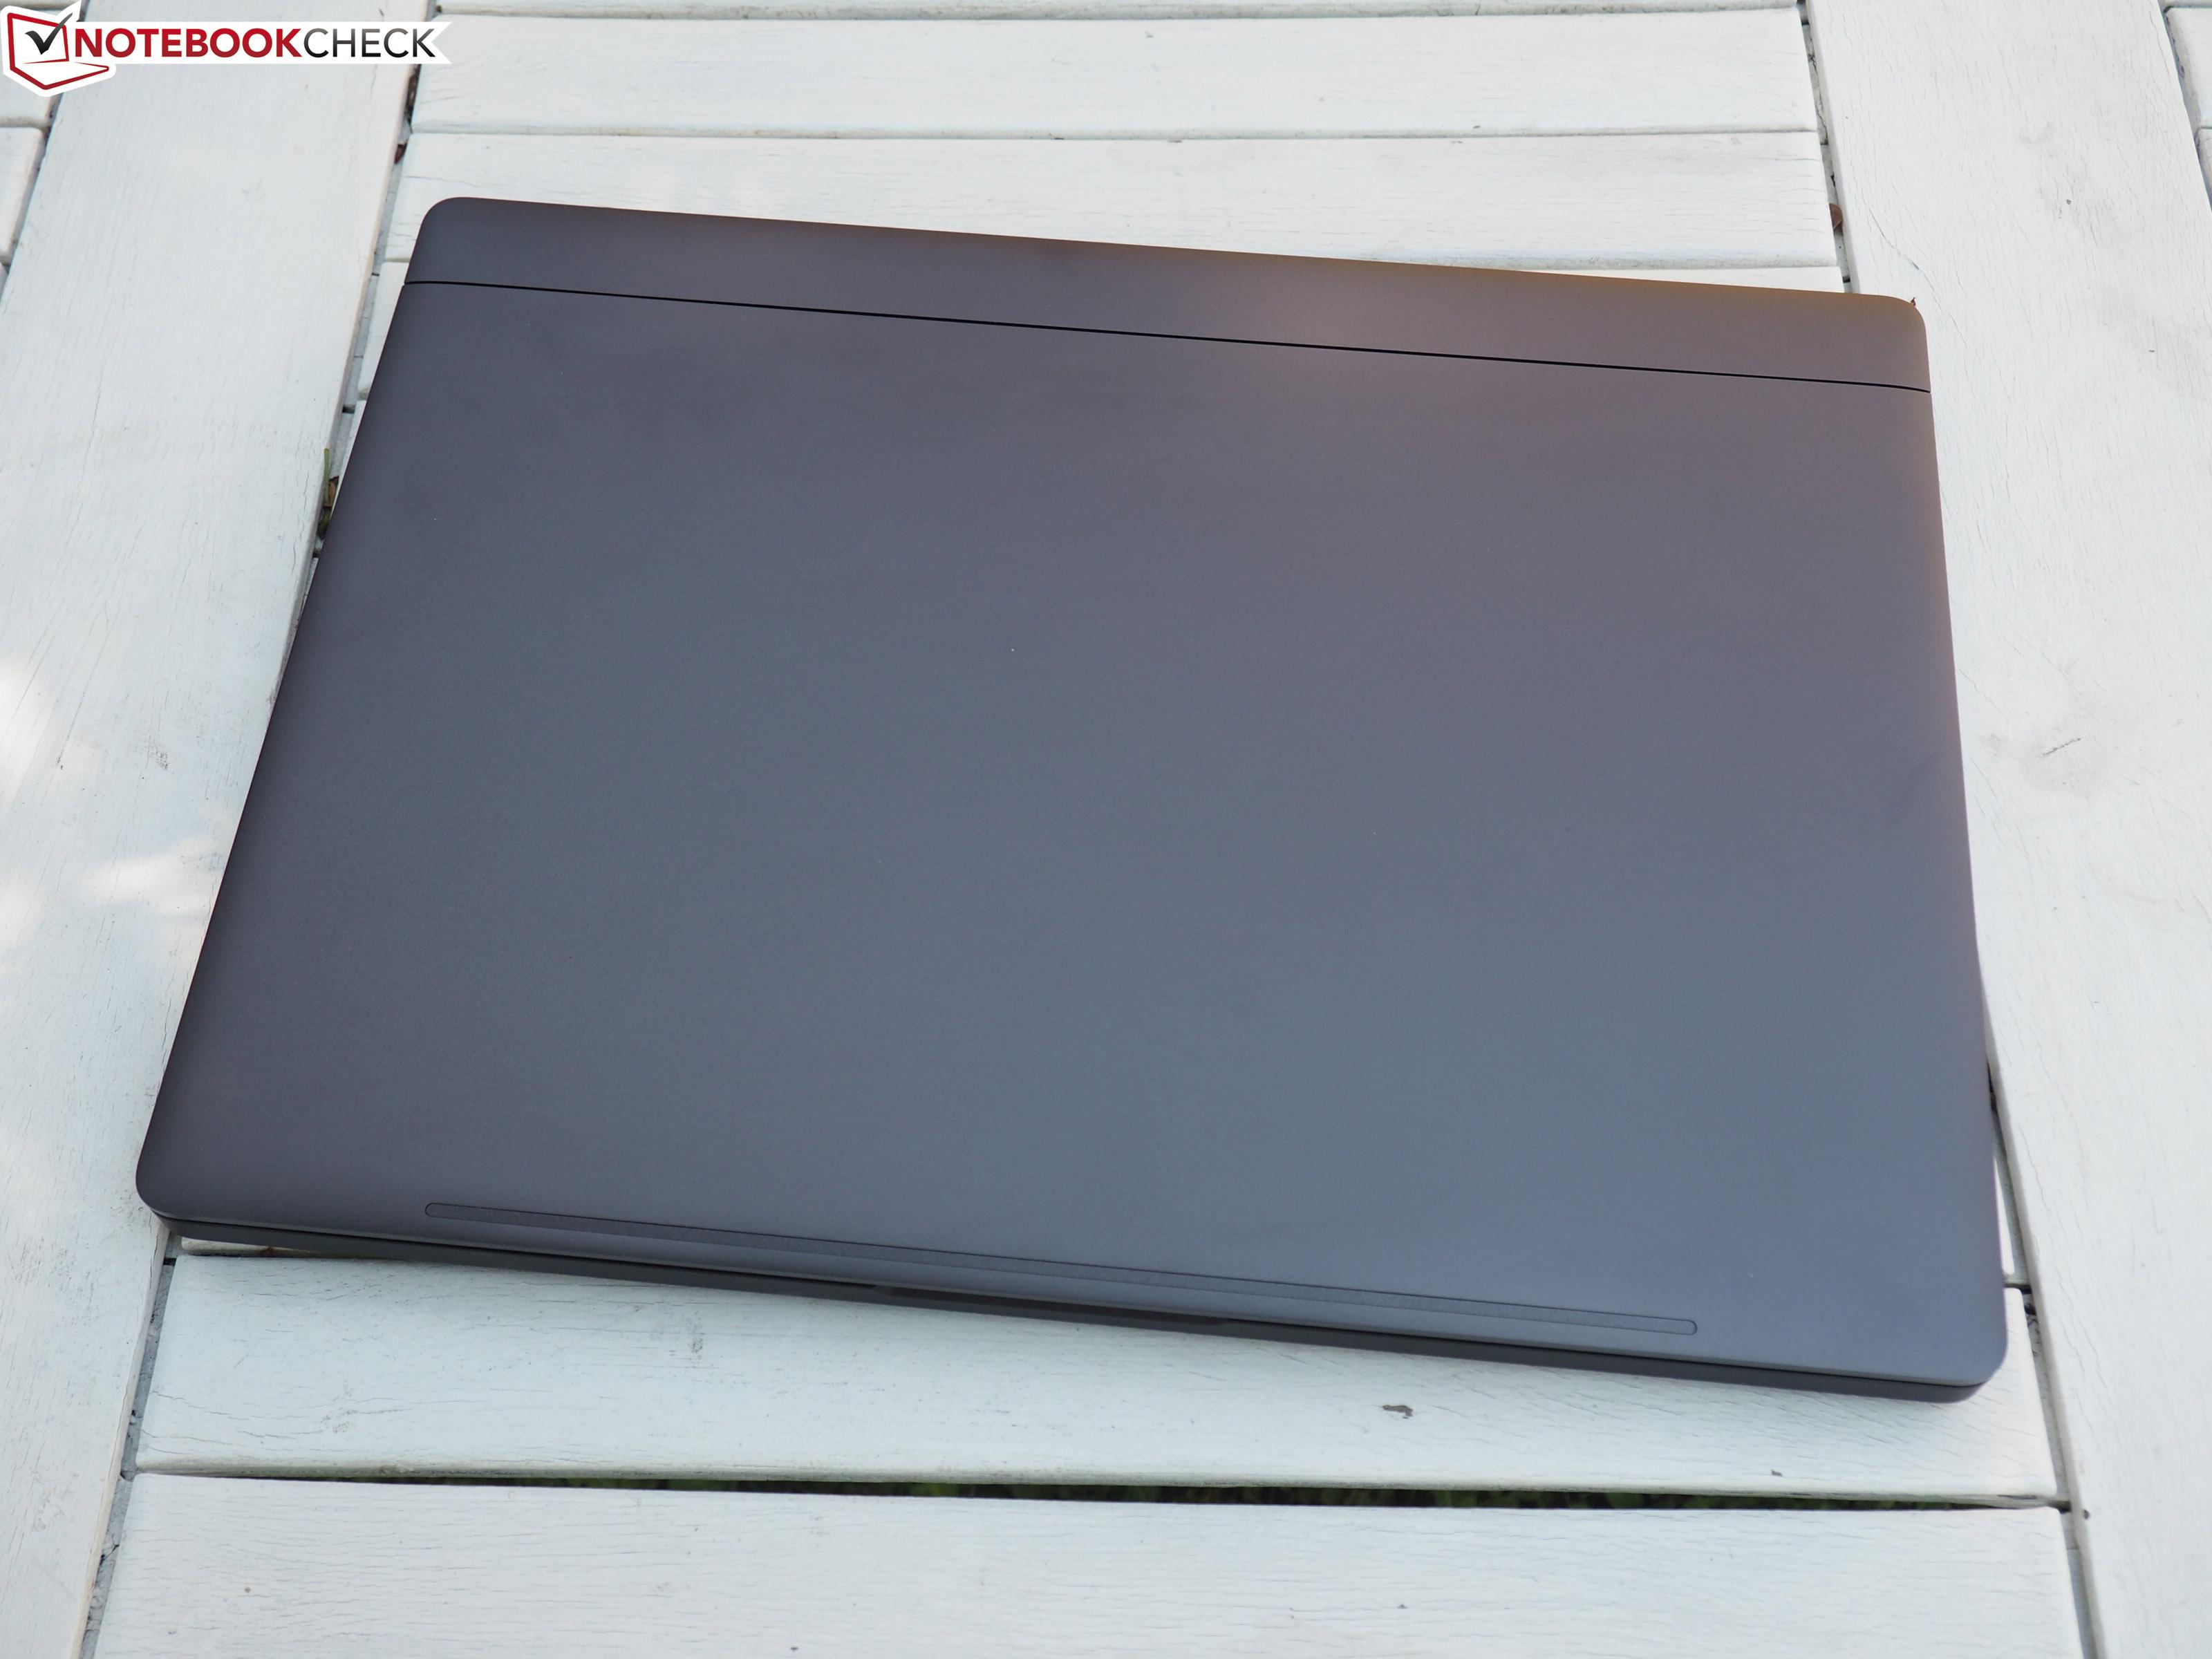 Xiaomi Mi Gaming Laptop (i5-7300HQ, GTX 1060, Full HD) Review